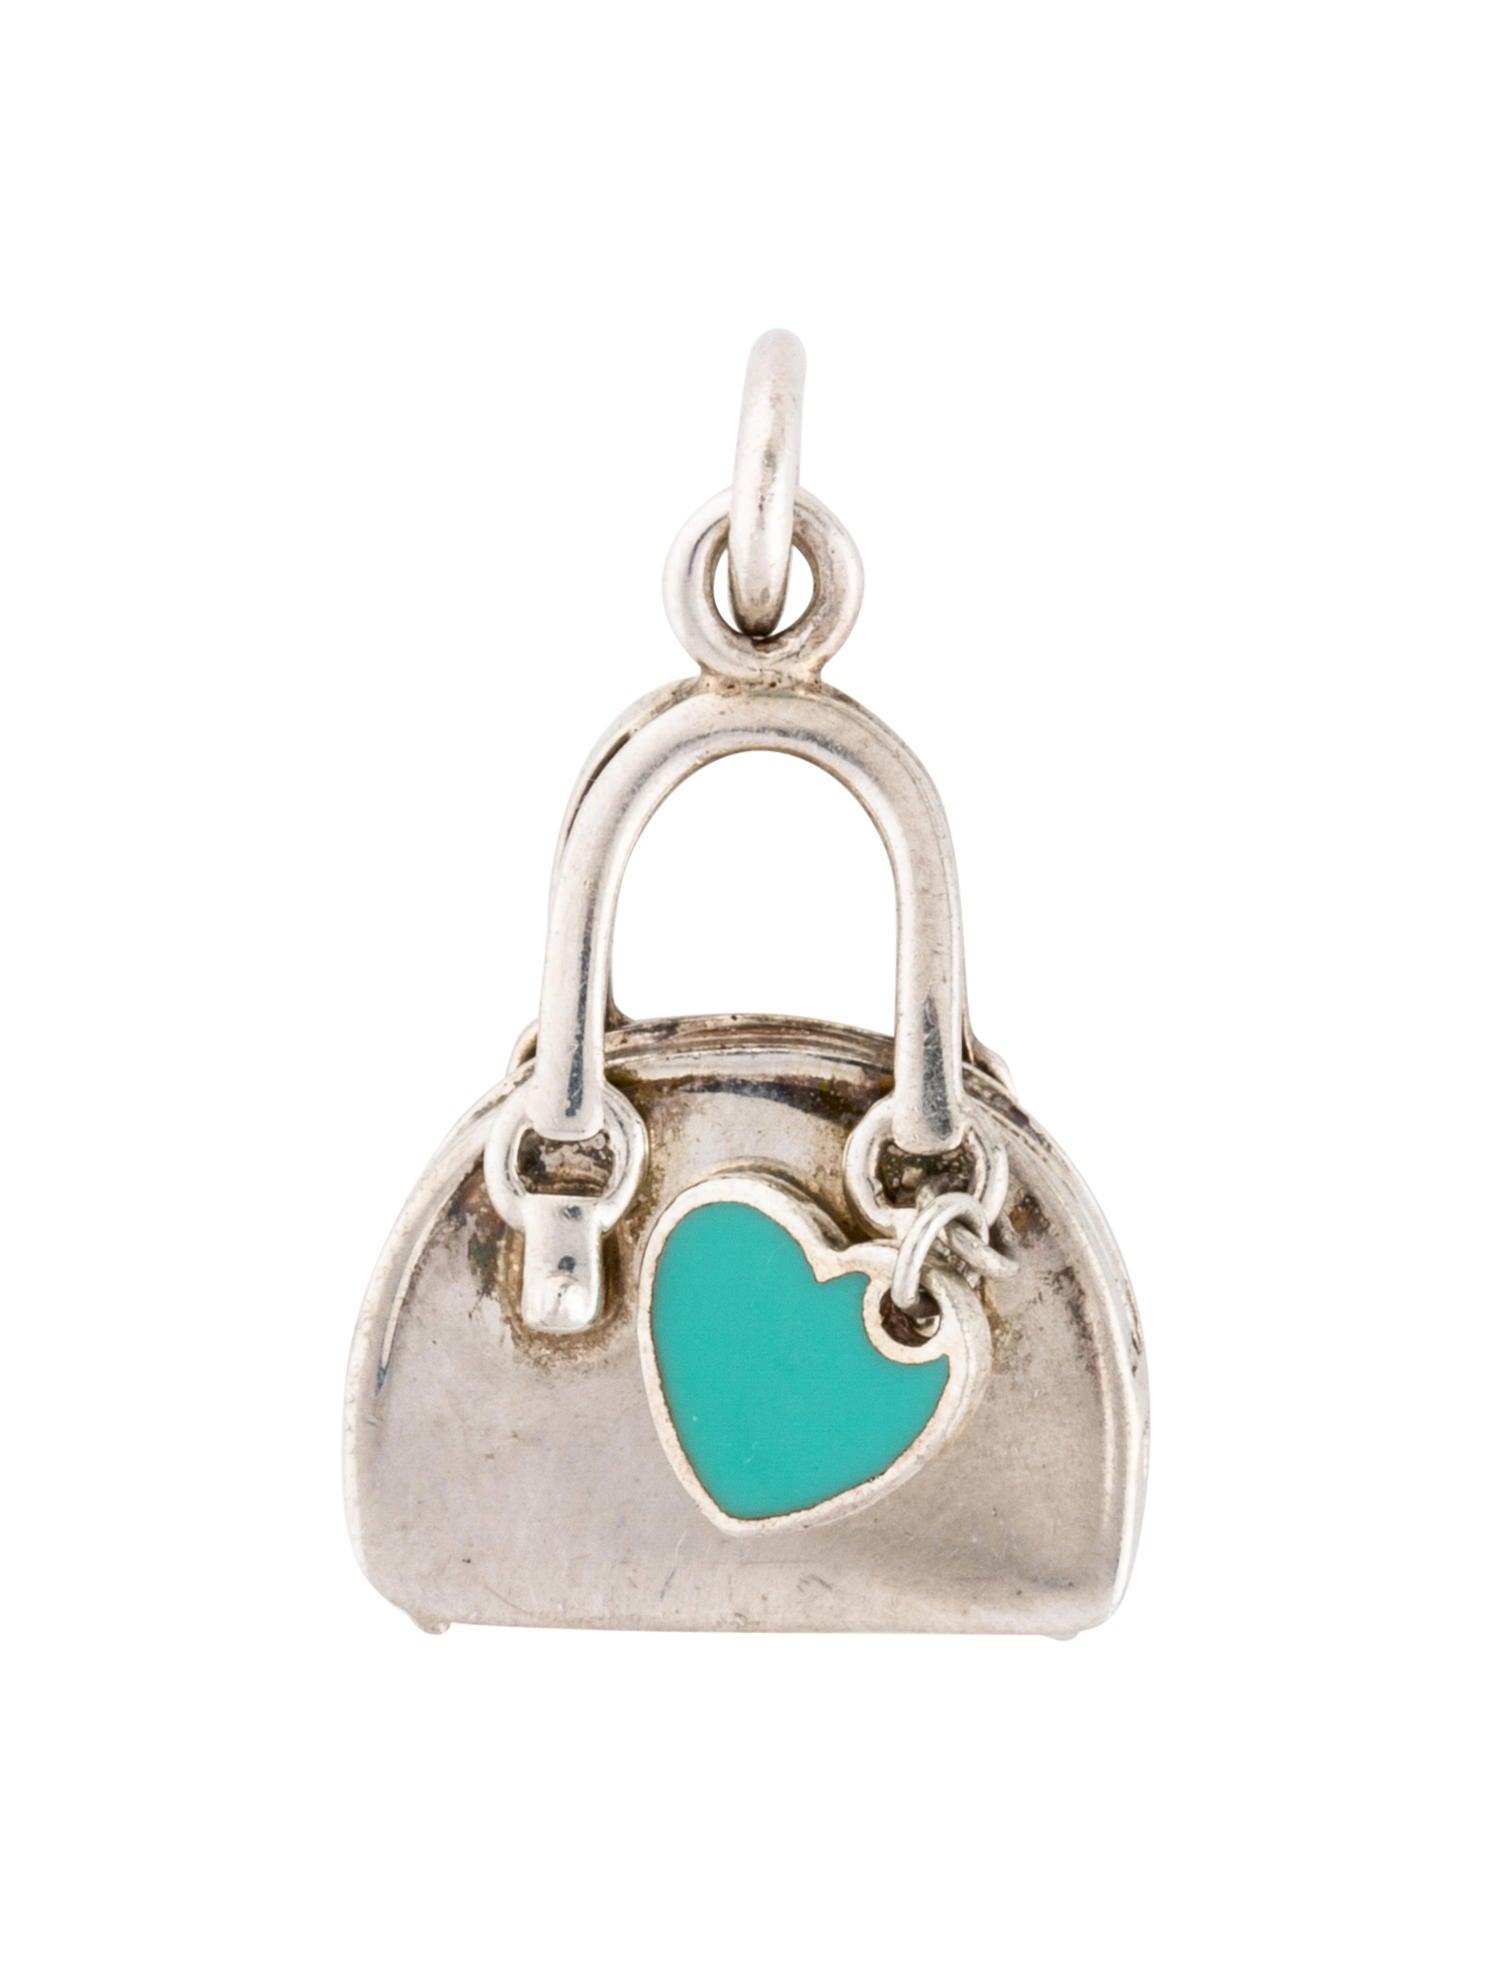 10be75f816 Tiffany Handbag Charm - Foto Handbag All Collections Salonagafiya.Com